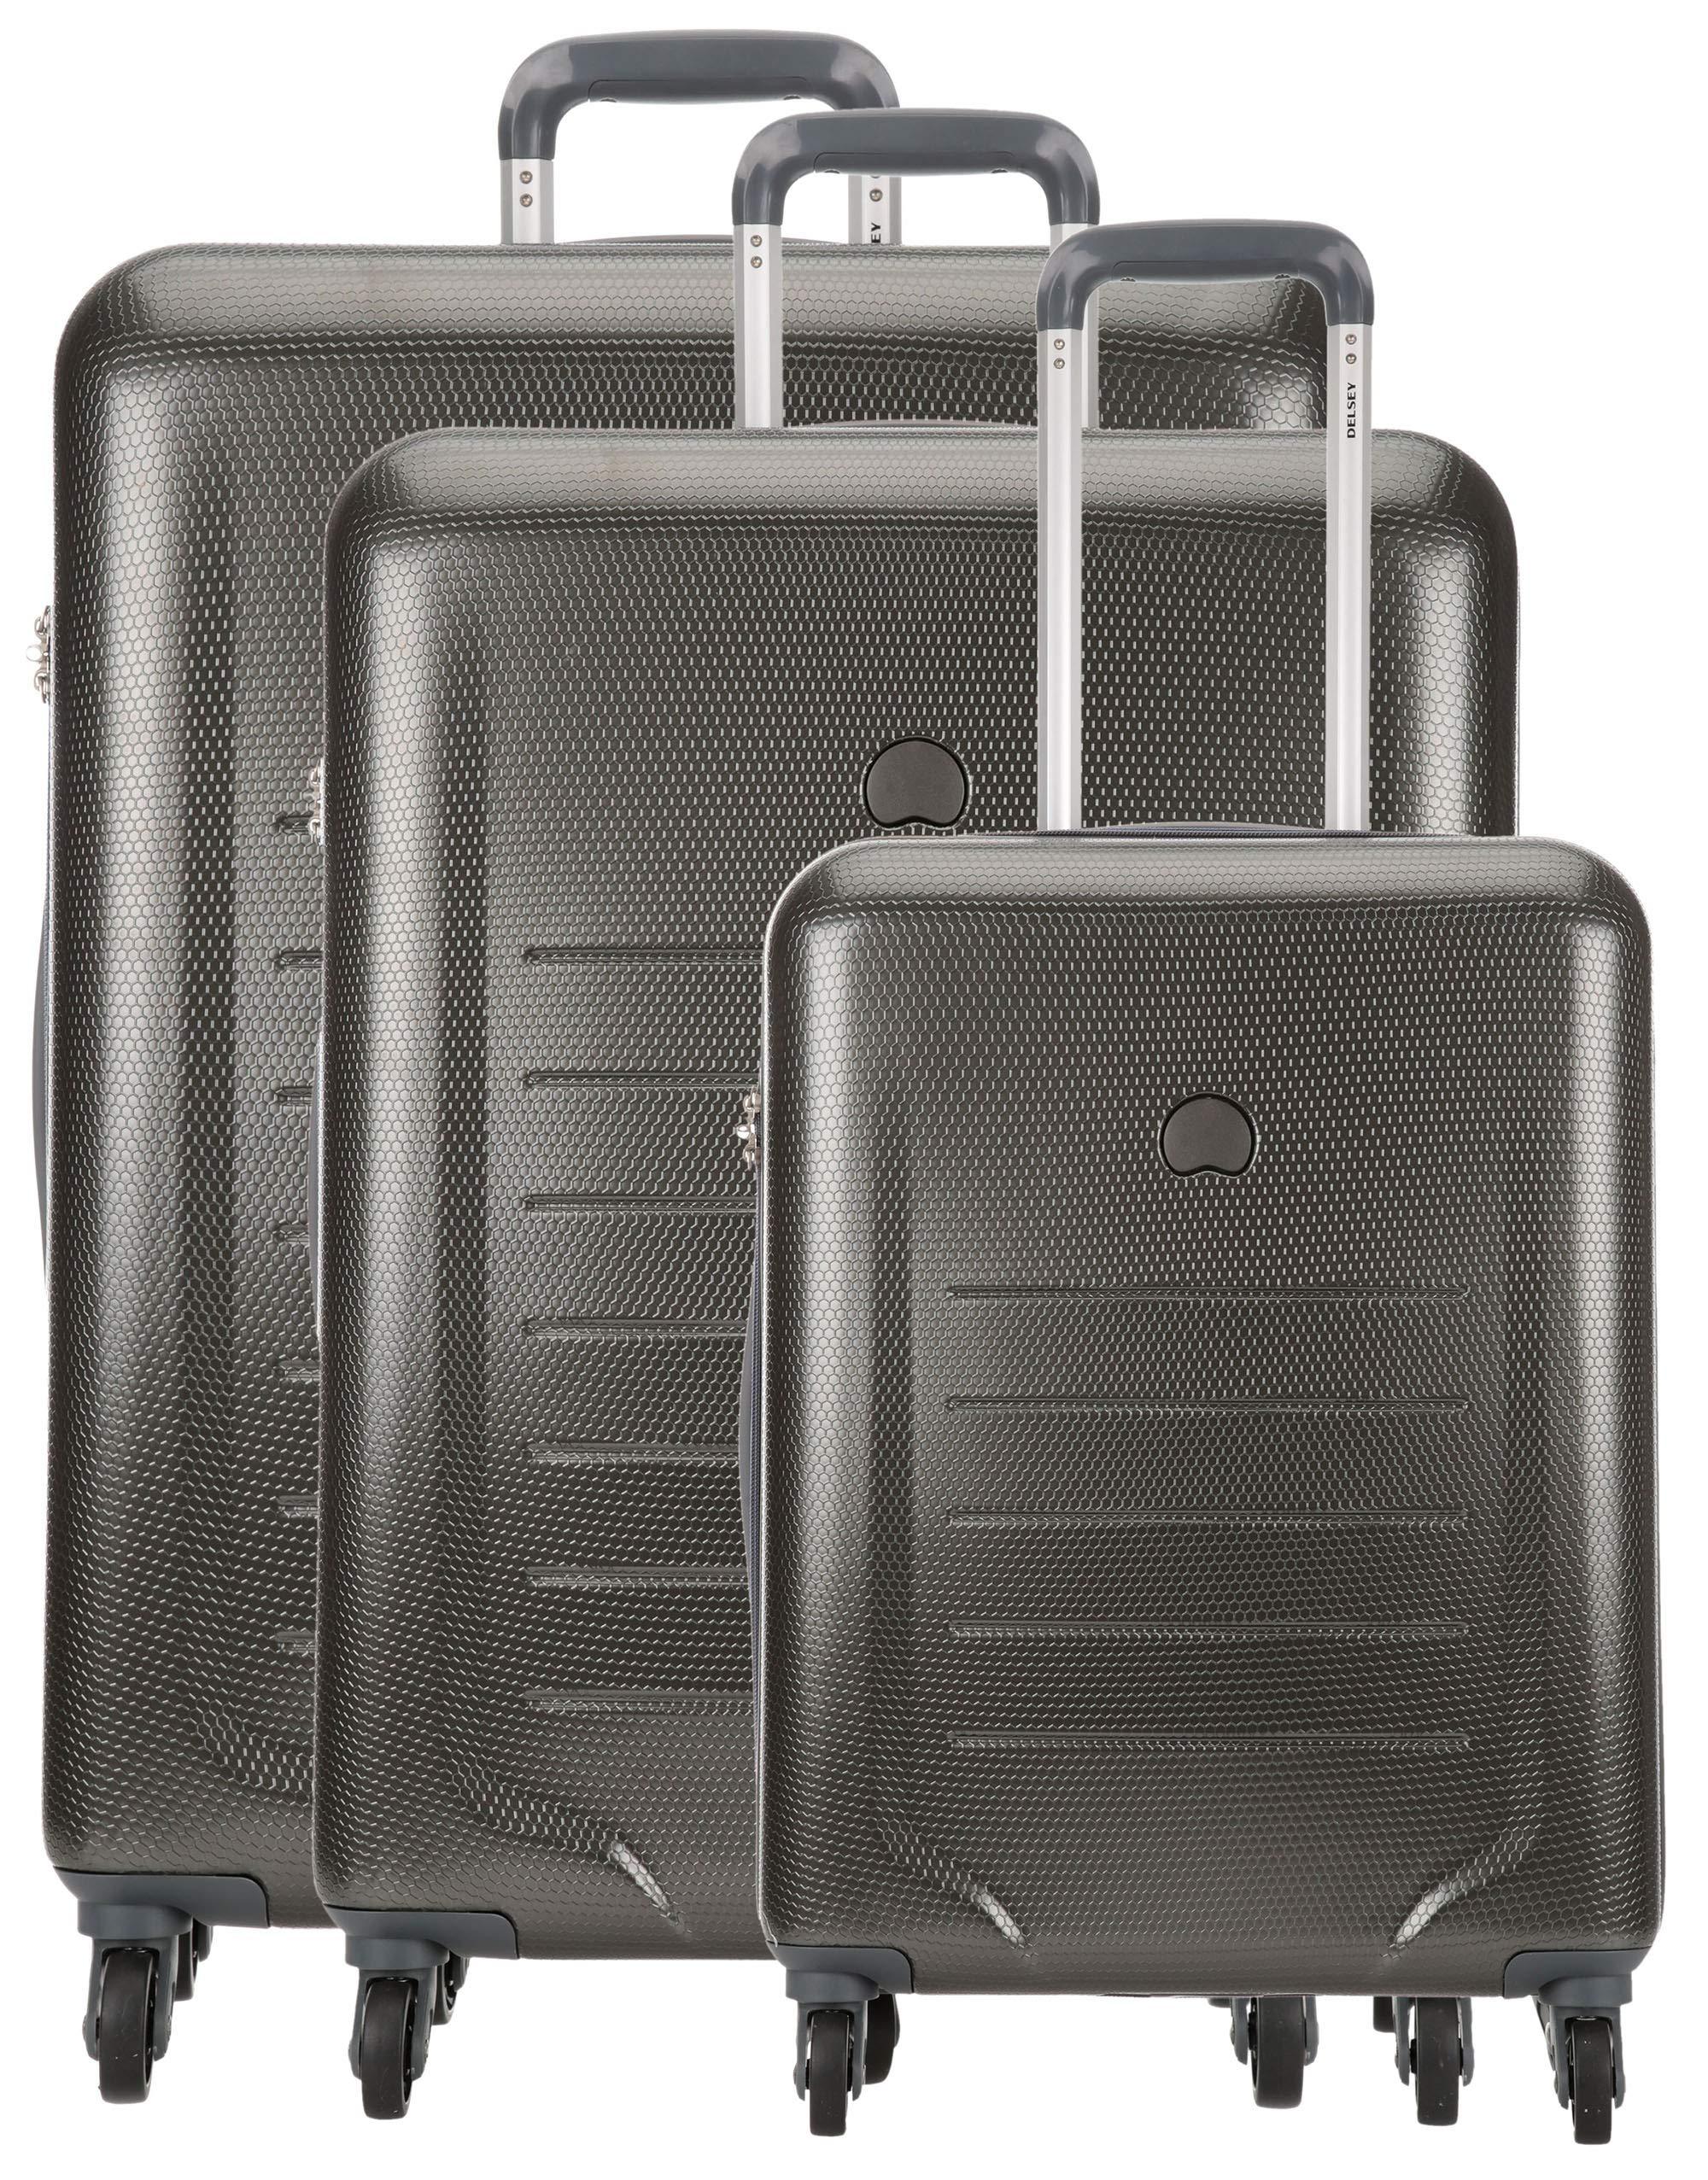 Delsey-Toliara-Suitcase-Set-4-Wheels-Metal-76